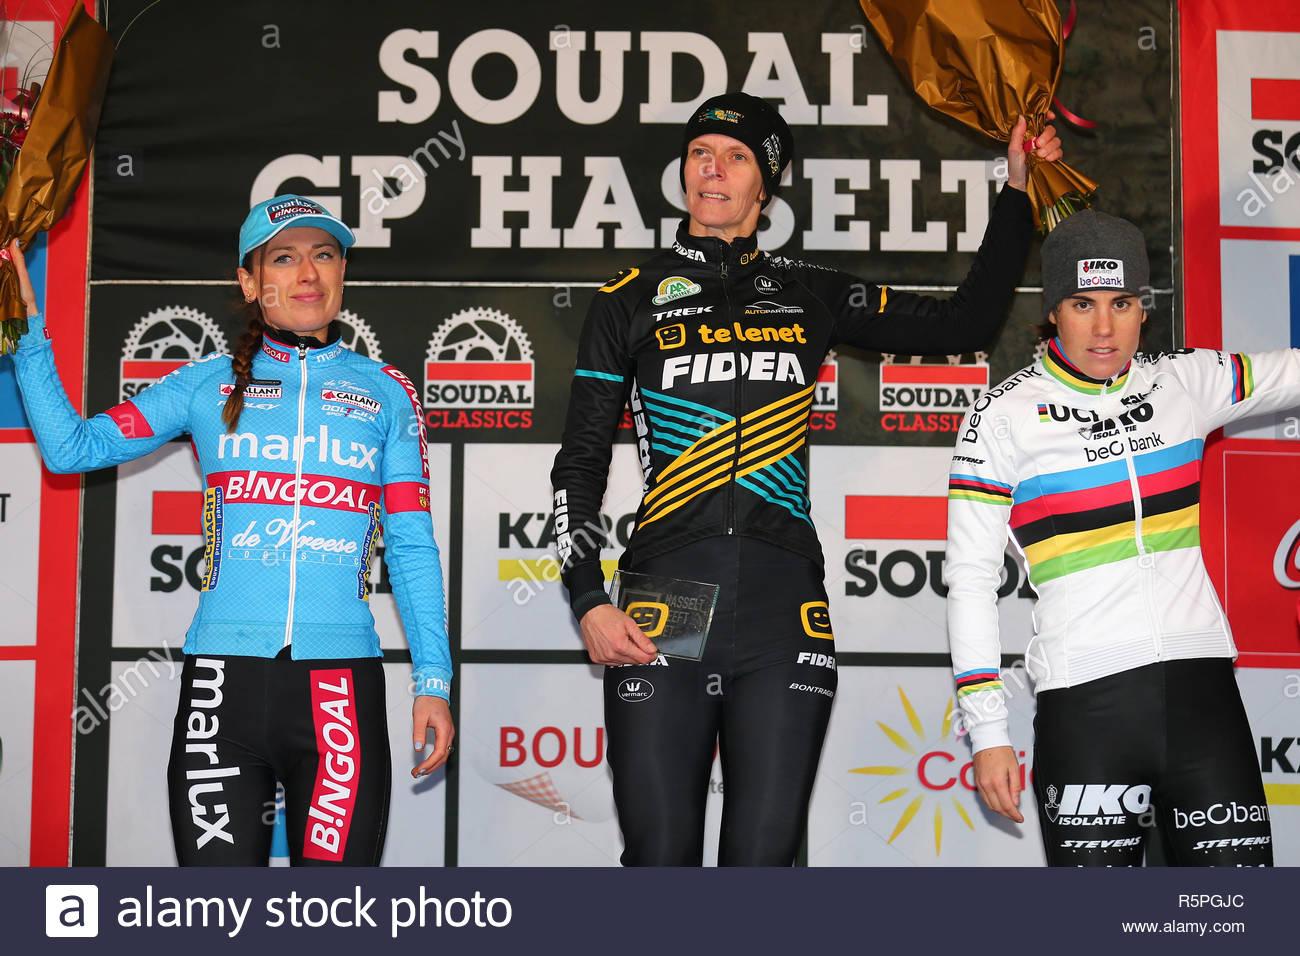 Hasselt Belgium 1 December 2018 Cyclecross Soudal Gp L R Denise